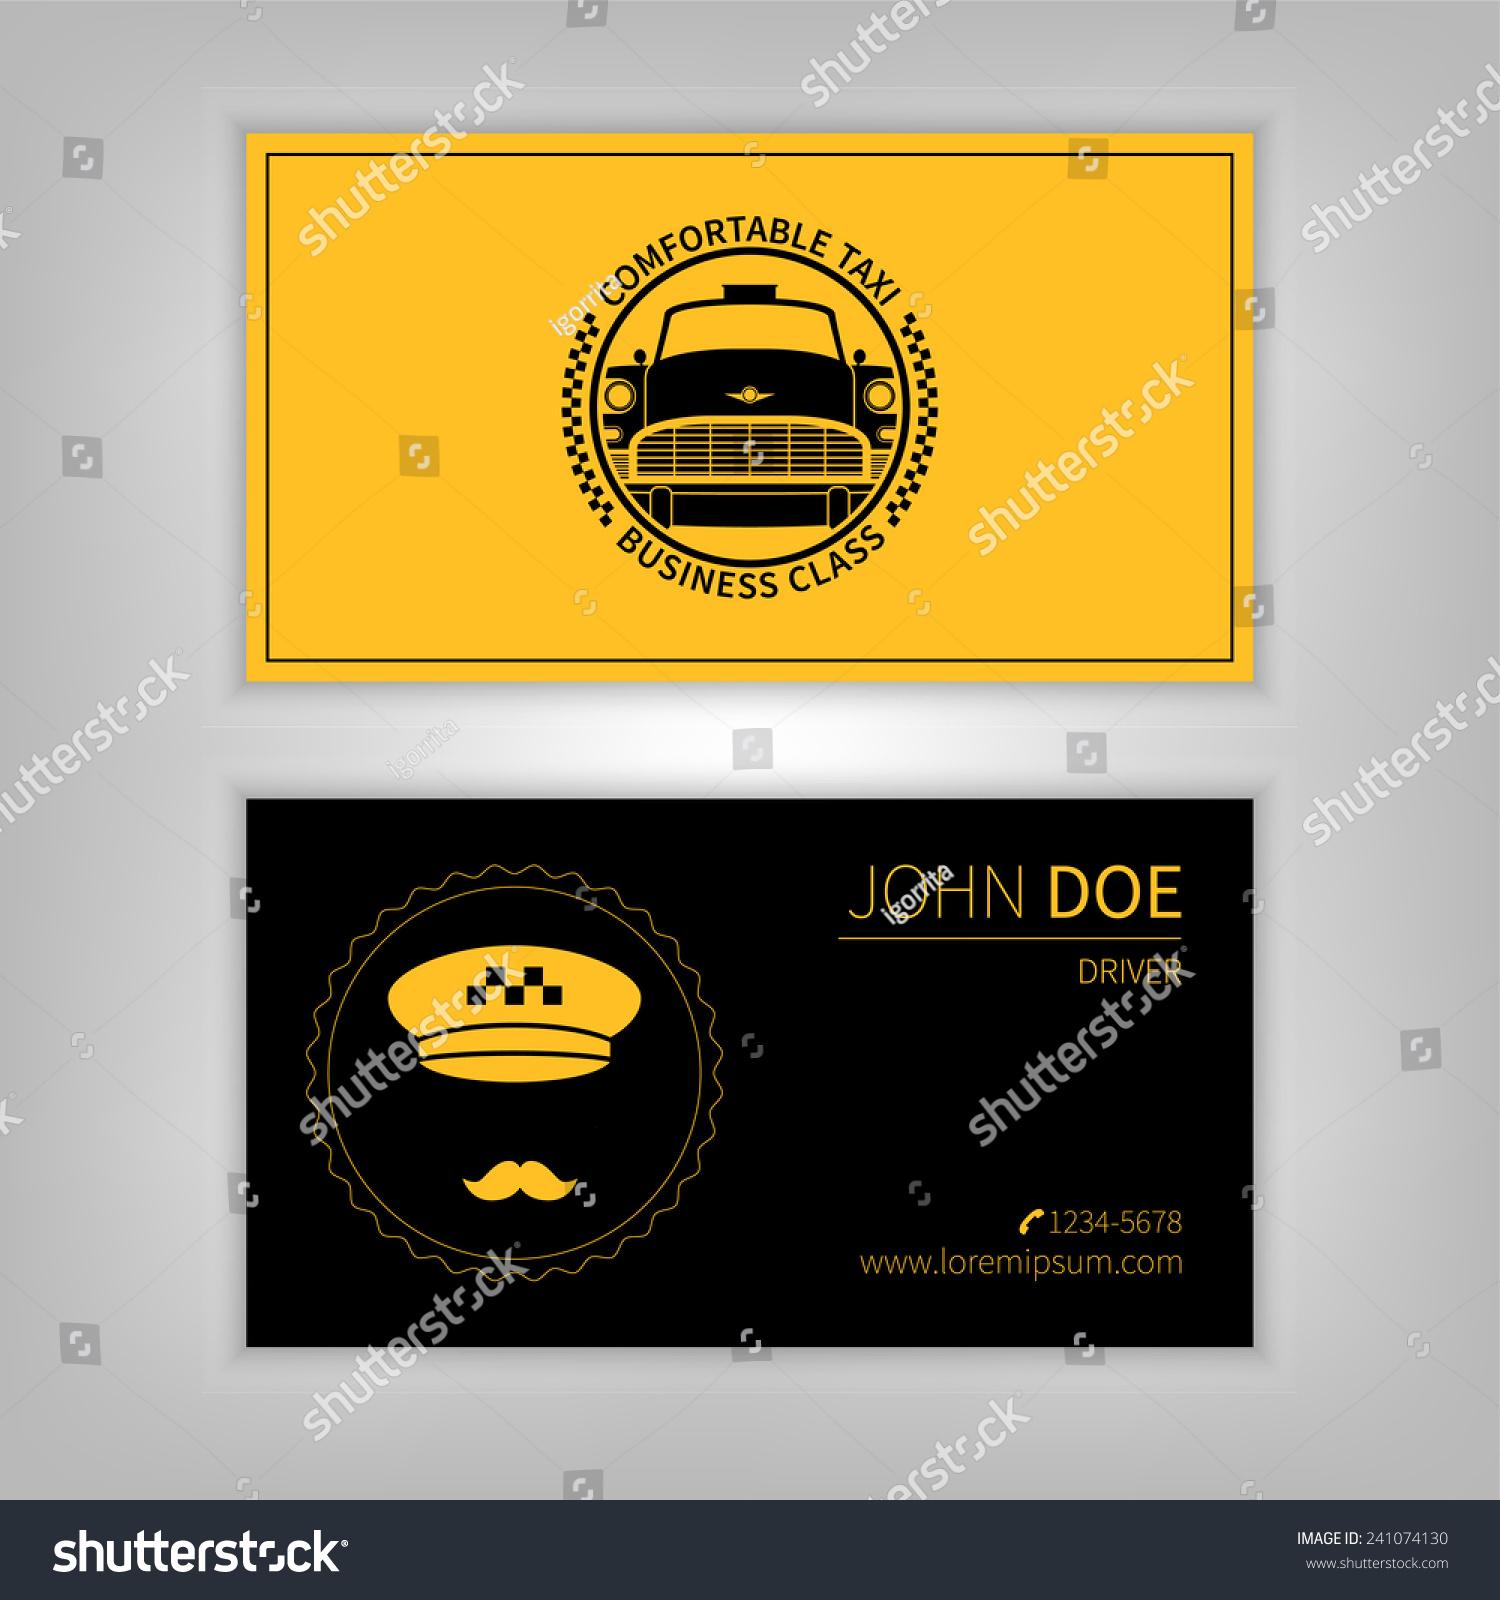 Taxi Business Card Design Template Stock Vector 241074130 - Shutterstock